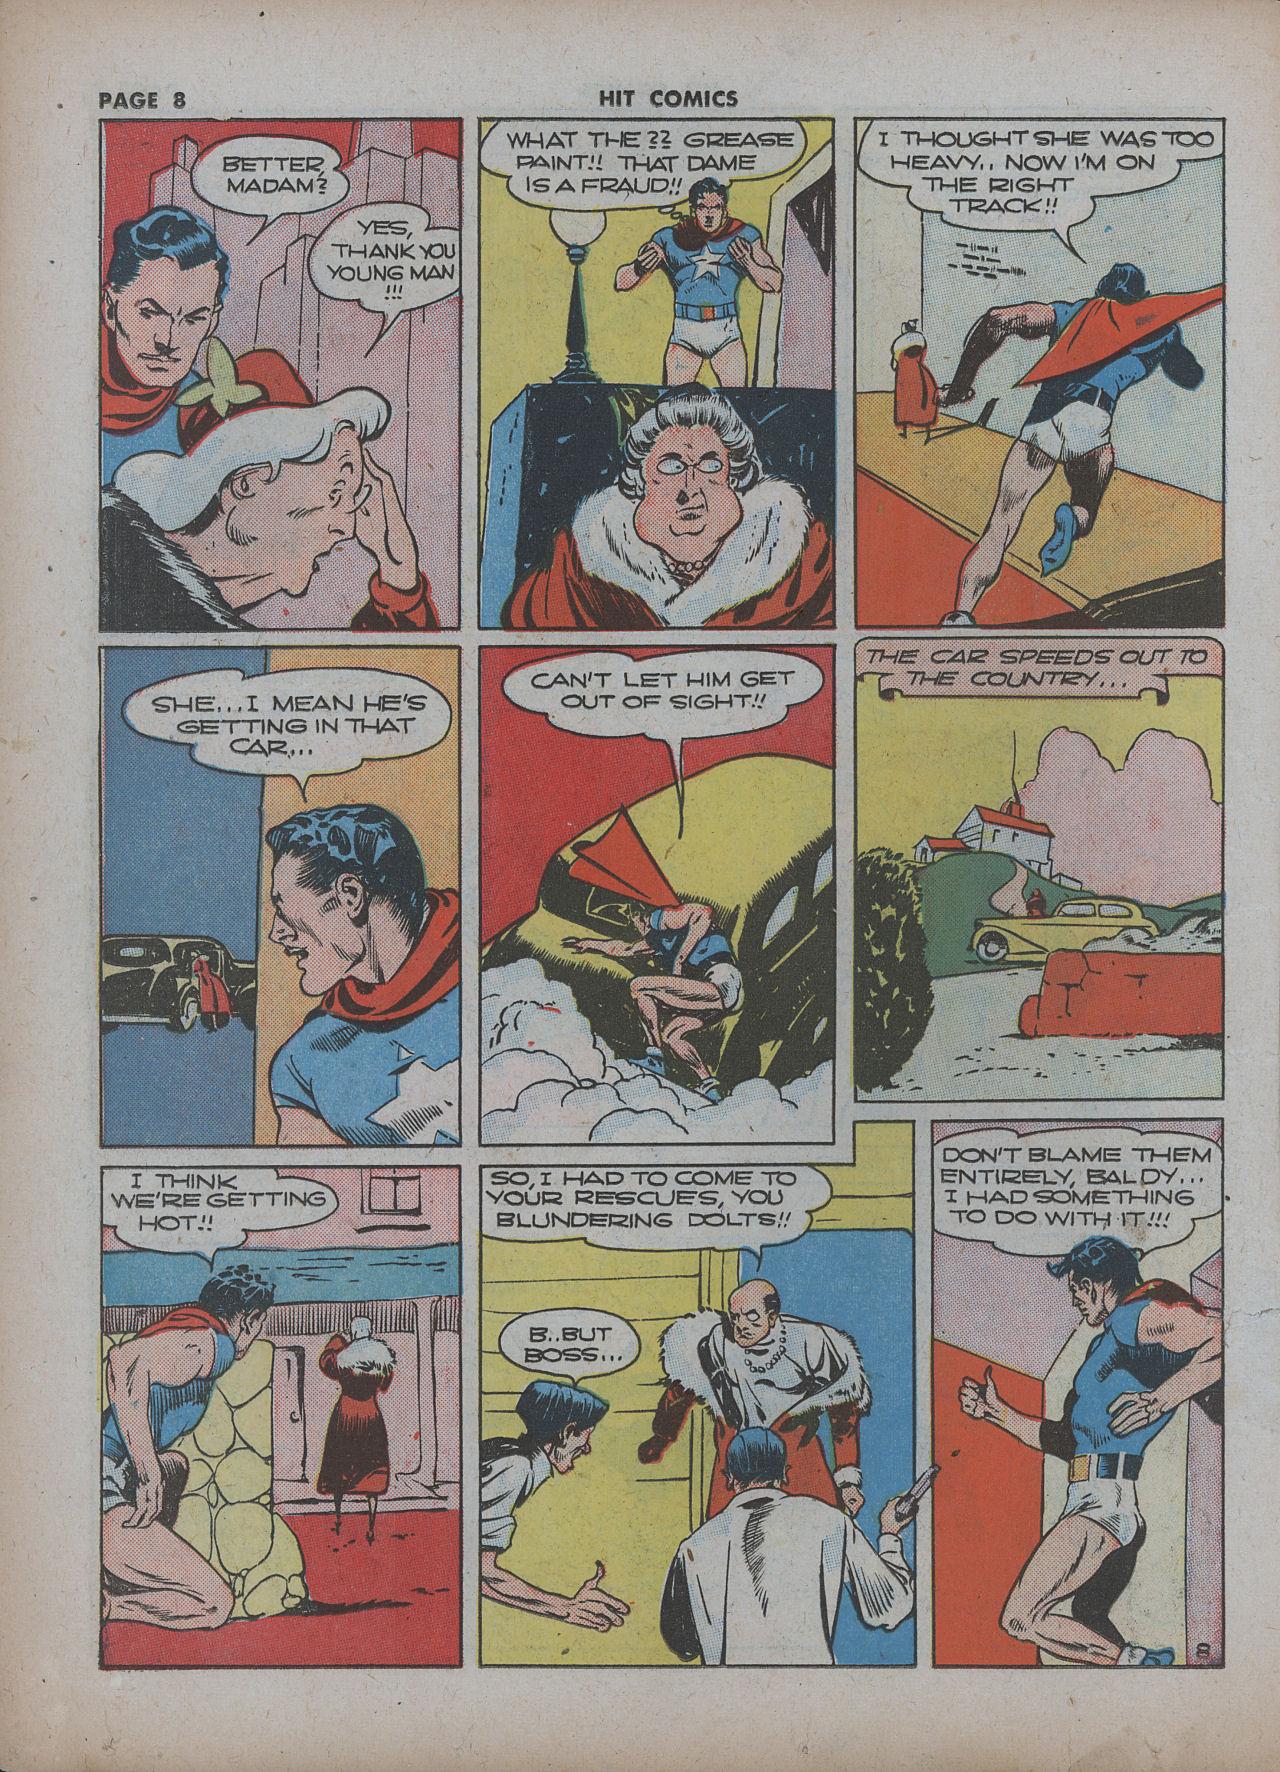 Read online Hit Comics comic -  Issue #22 - 10